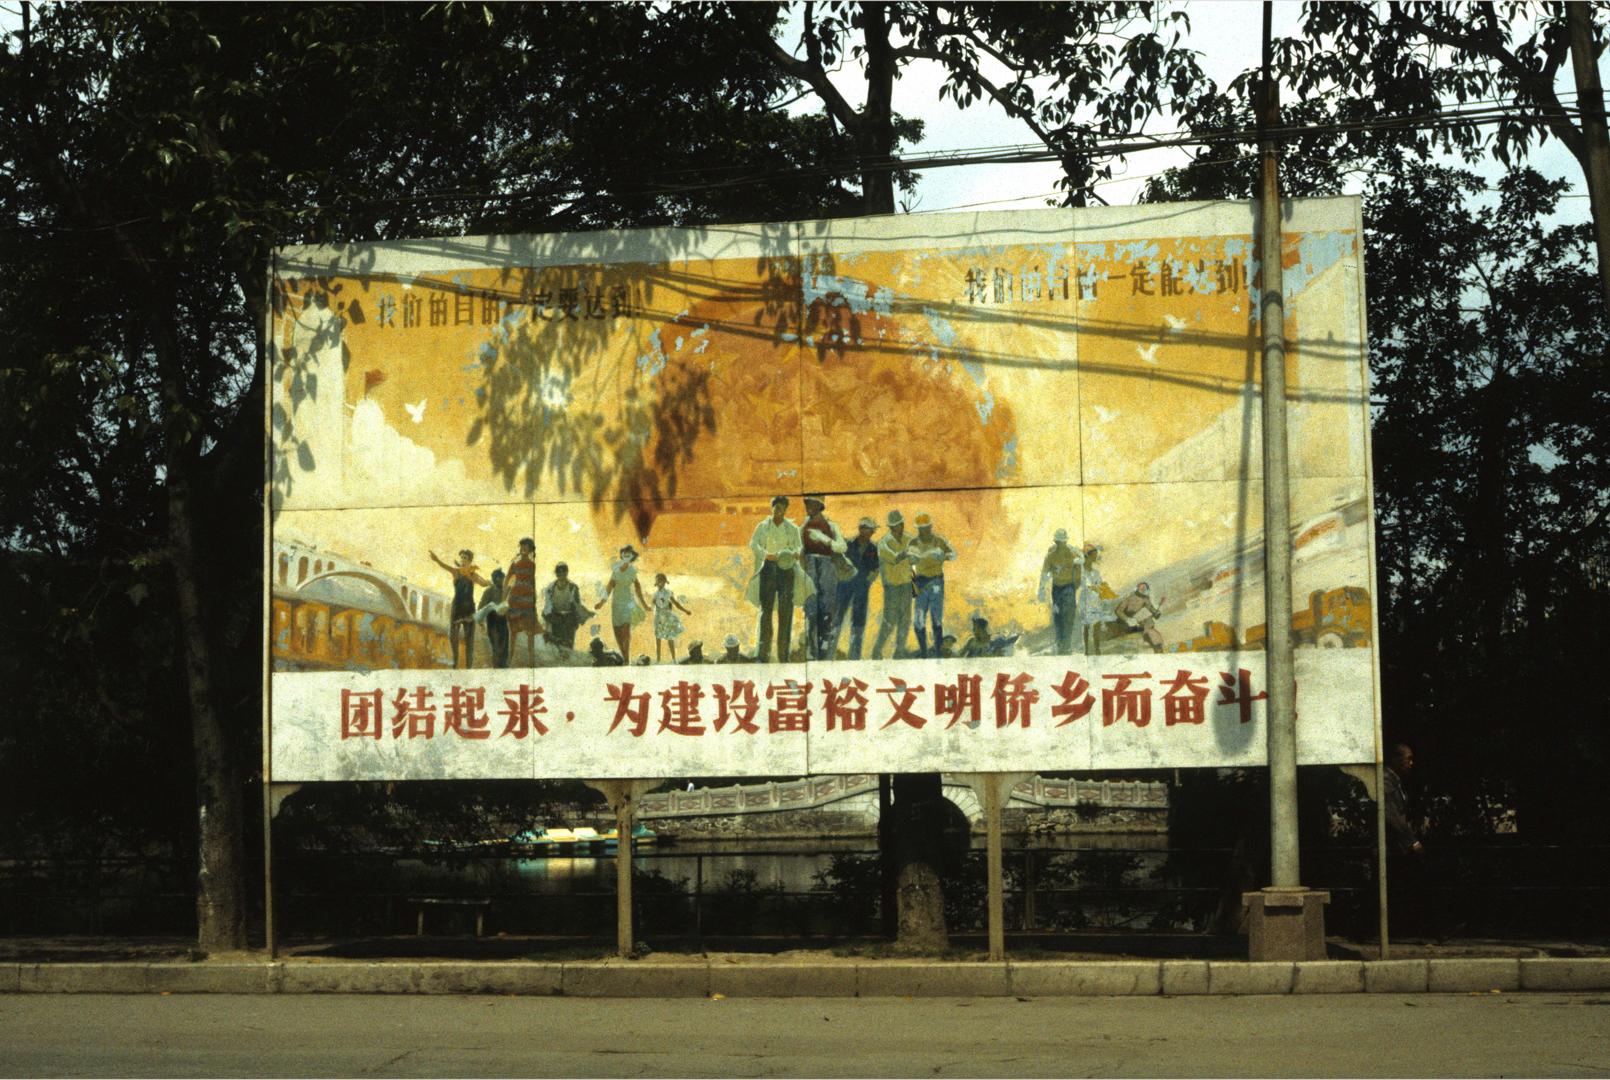 Modern China Billboard 1982 (22×14.75)